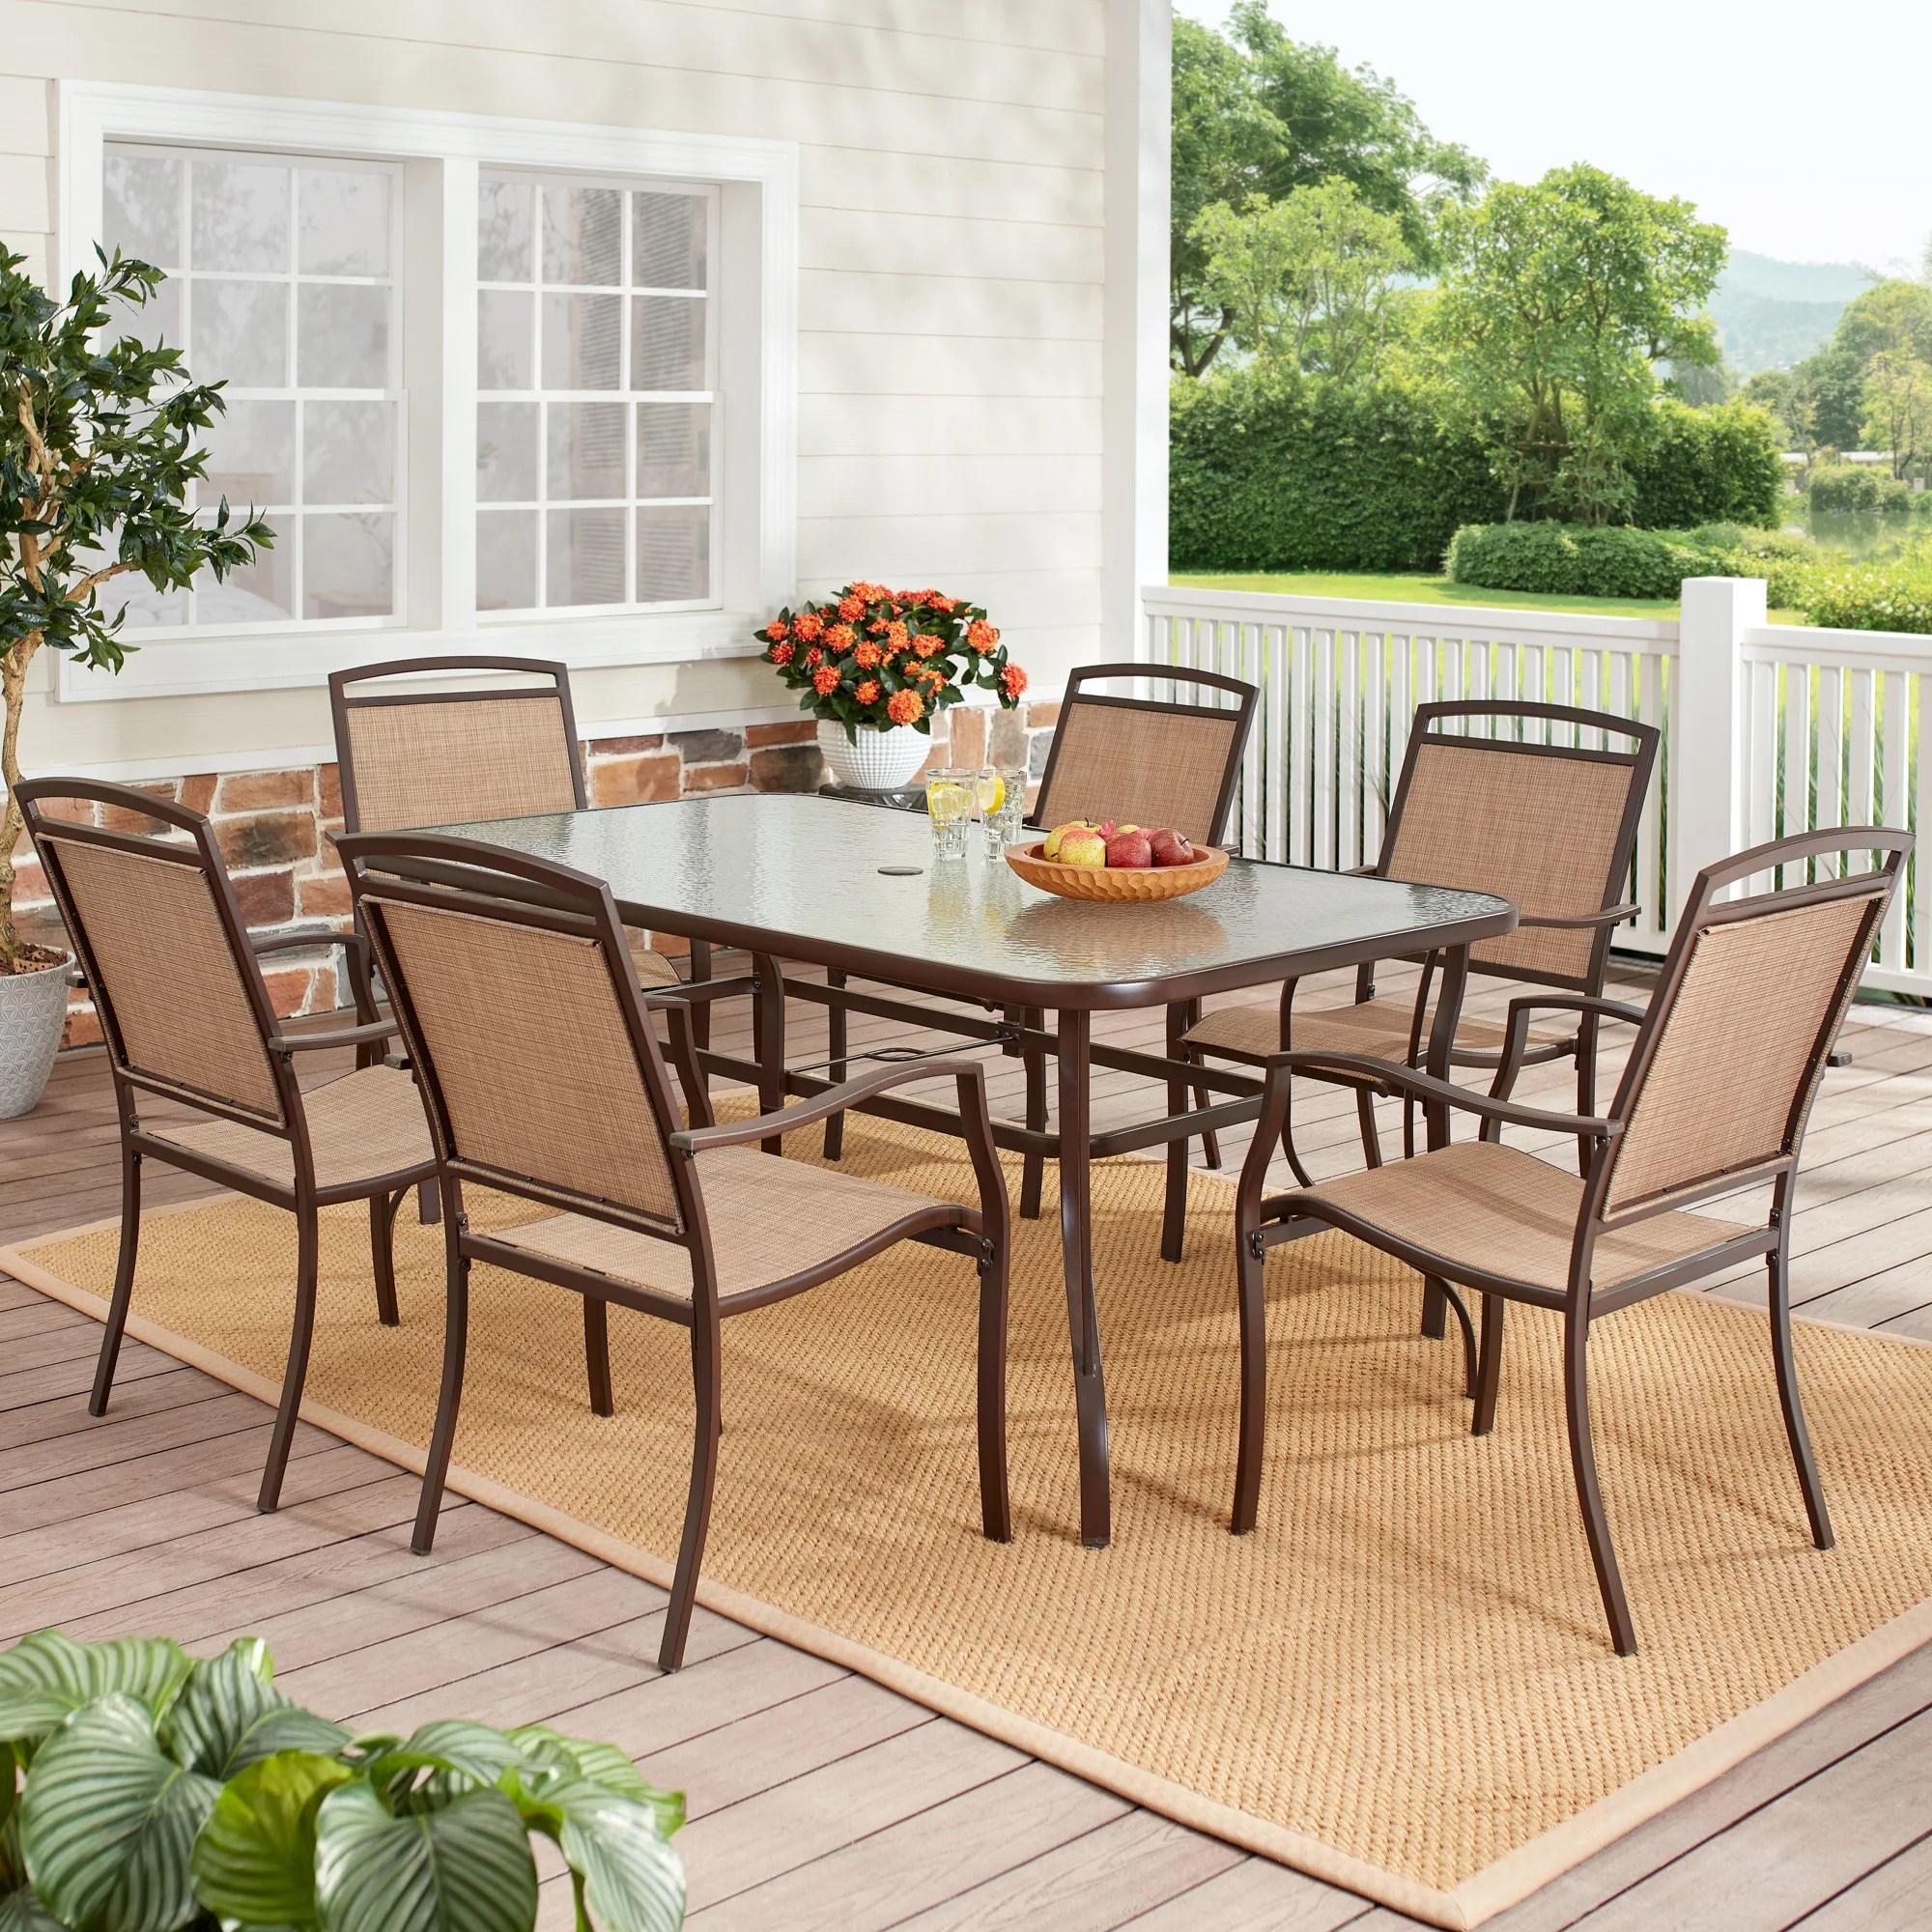 mainstays sand dune 7 piece outdoor patio dining set walmart com